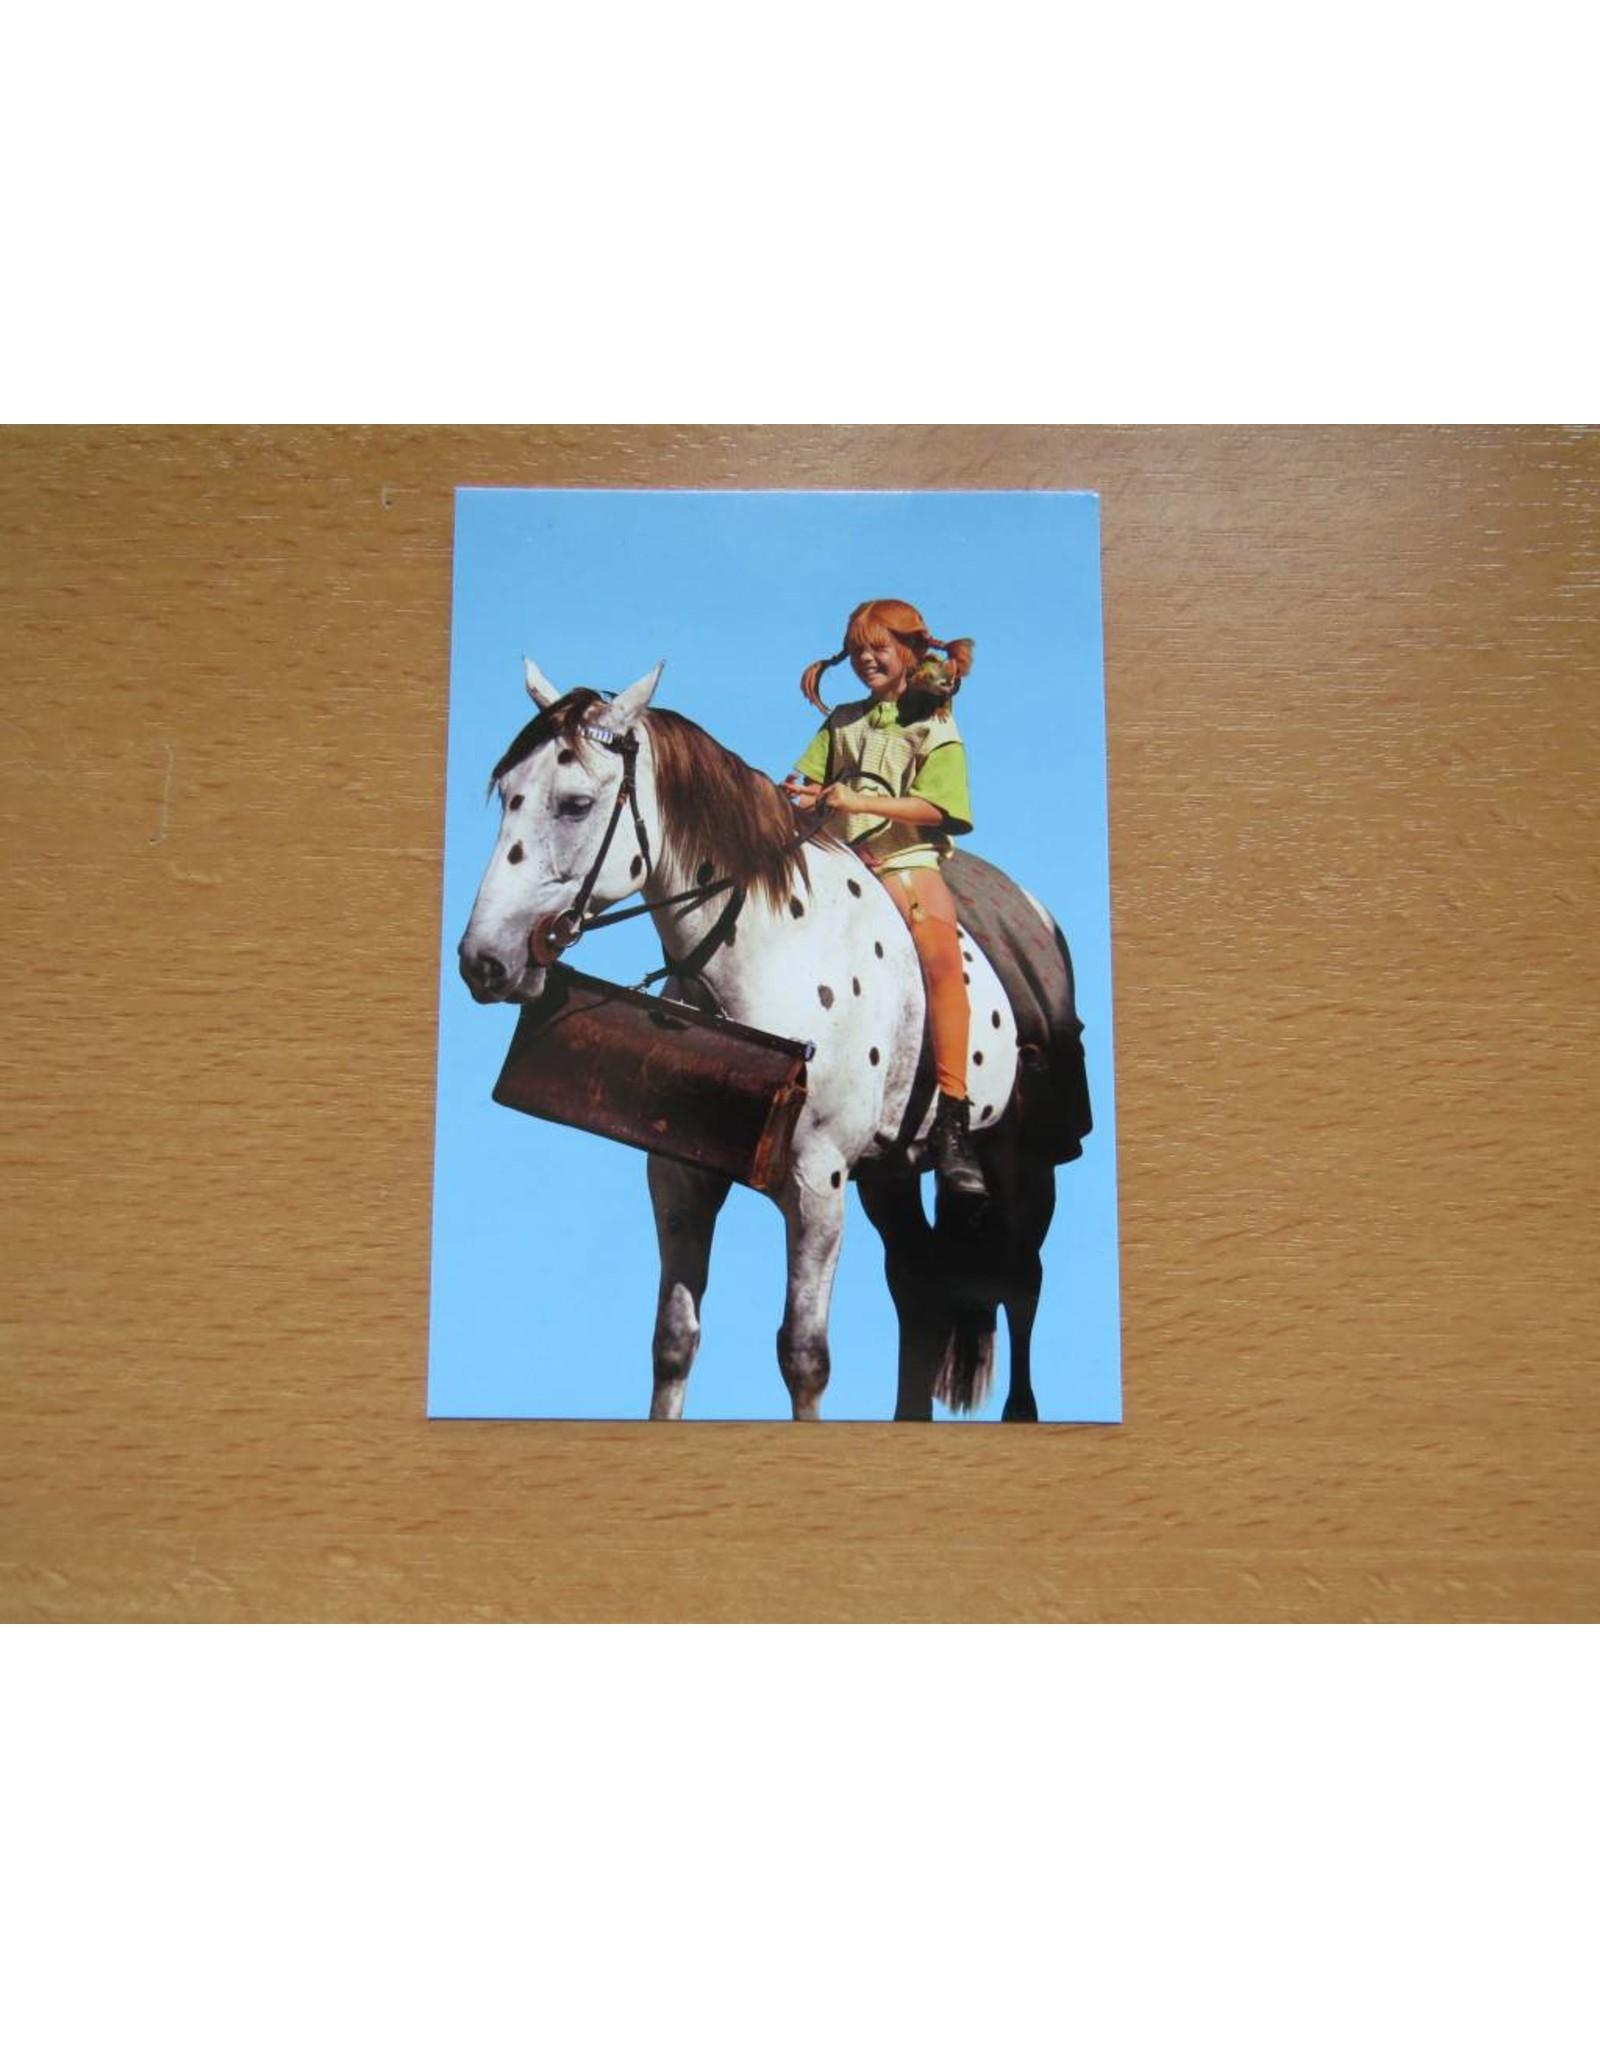 Pippi Langkous Pippi Longstocking card - Old Man